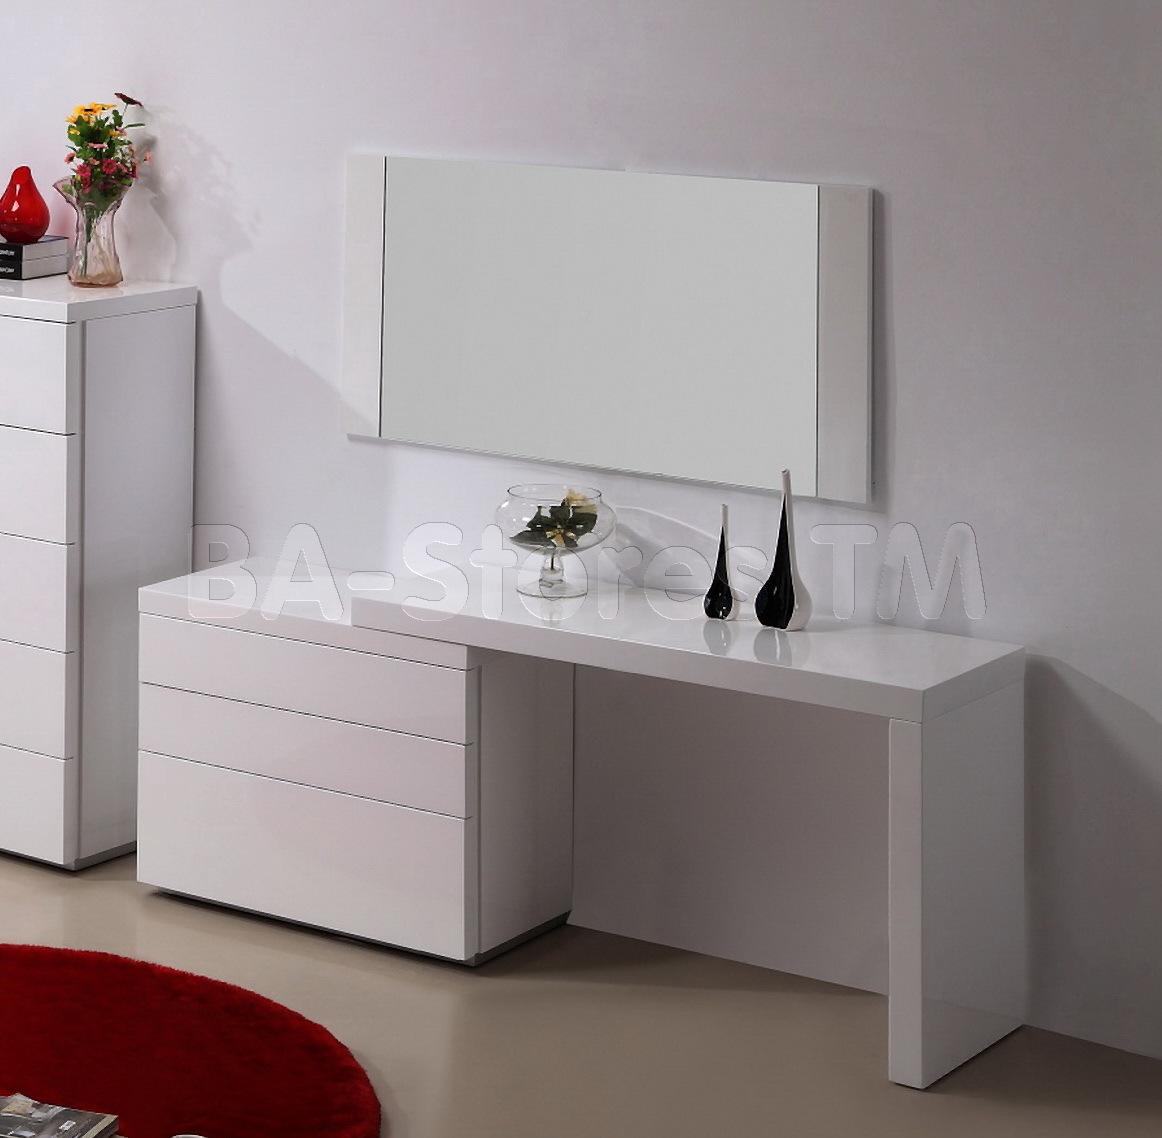 Mirrored Furniture Ikea Hawk Haven